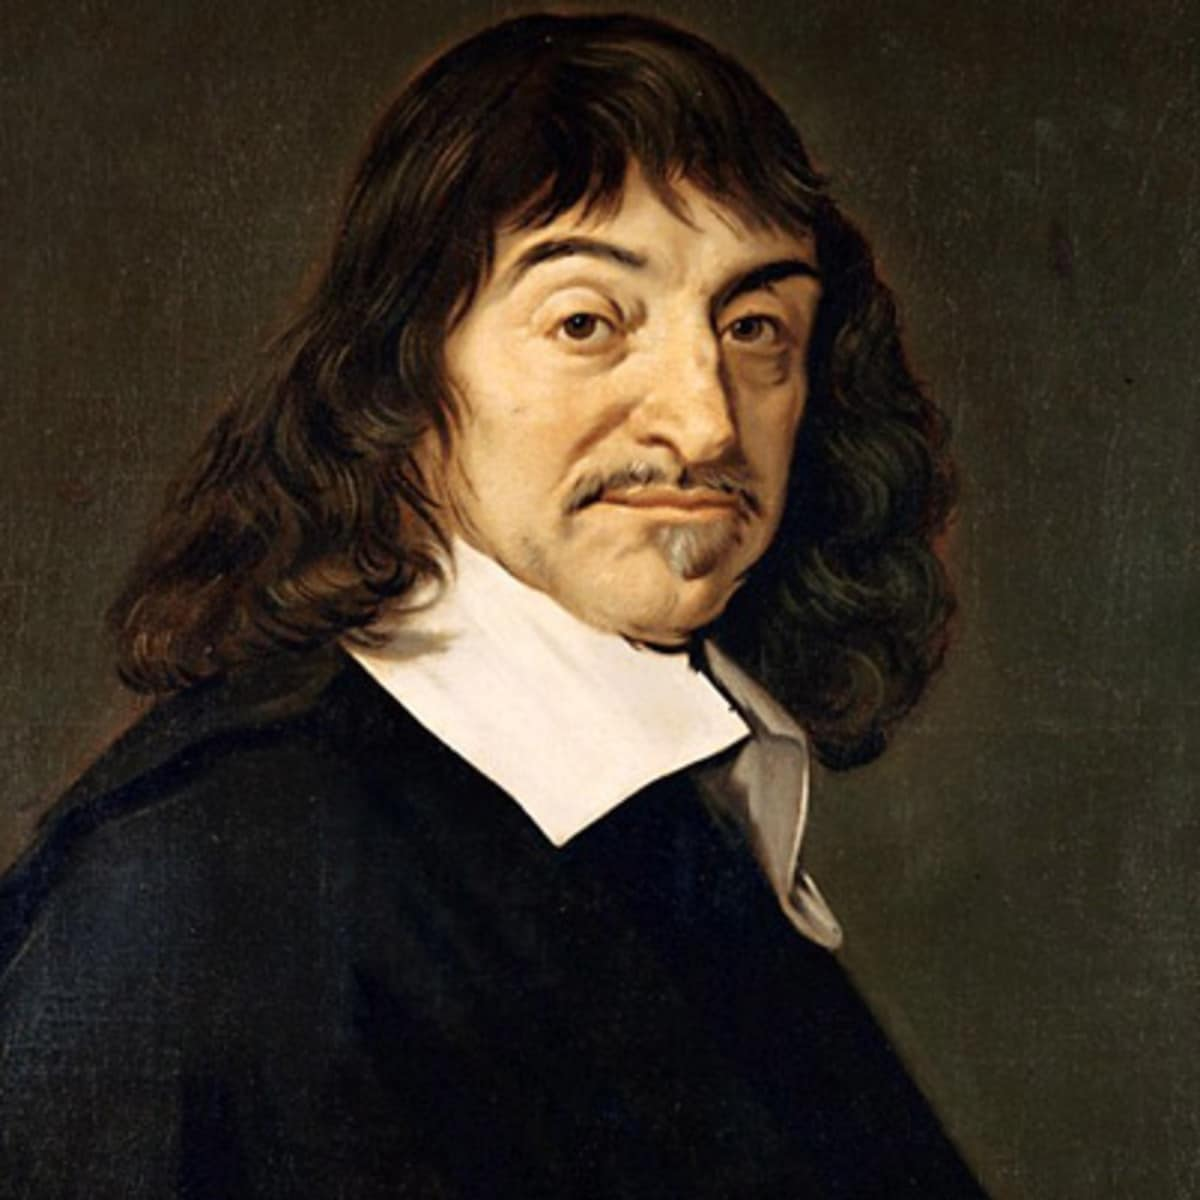 "e98415cc693ab00151d027876e165c7f 3 - Discourse on (Cartesian) Method: Kurt Smith ""Provides an Understanding"" of René Descartes' Philosophy"